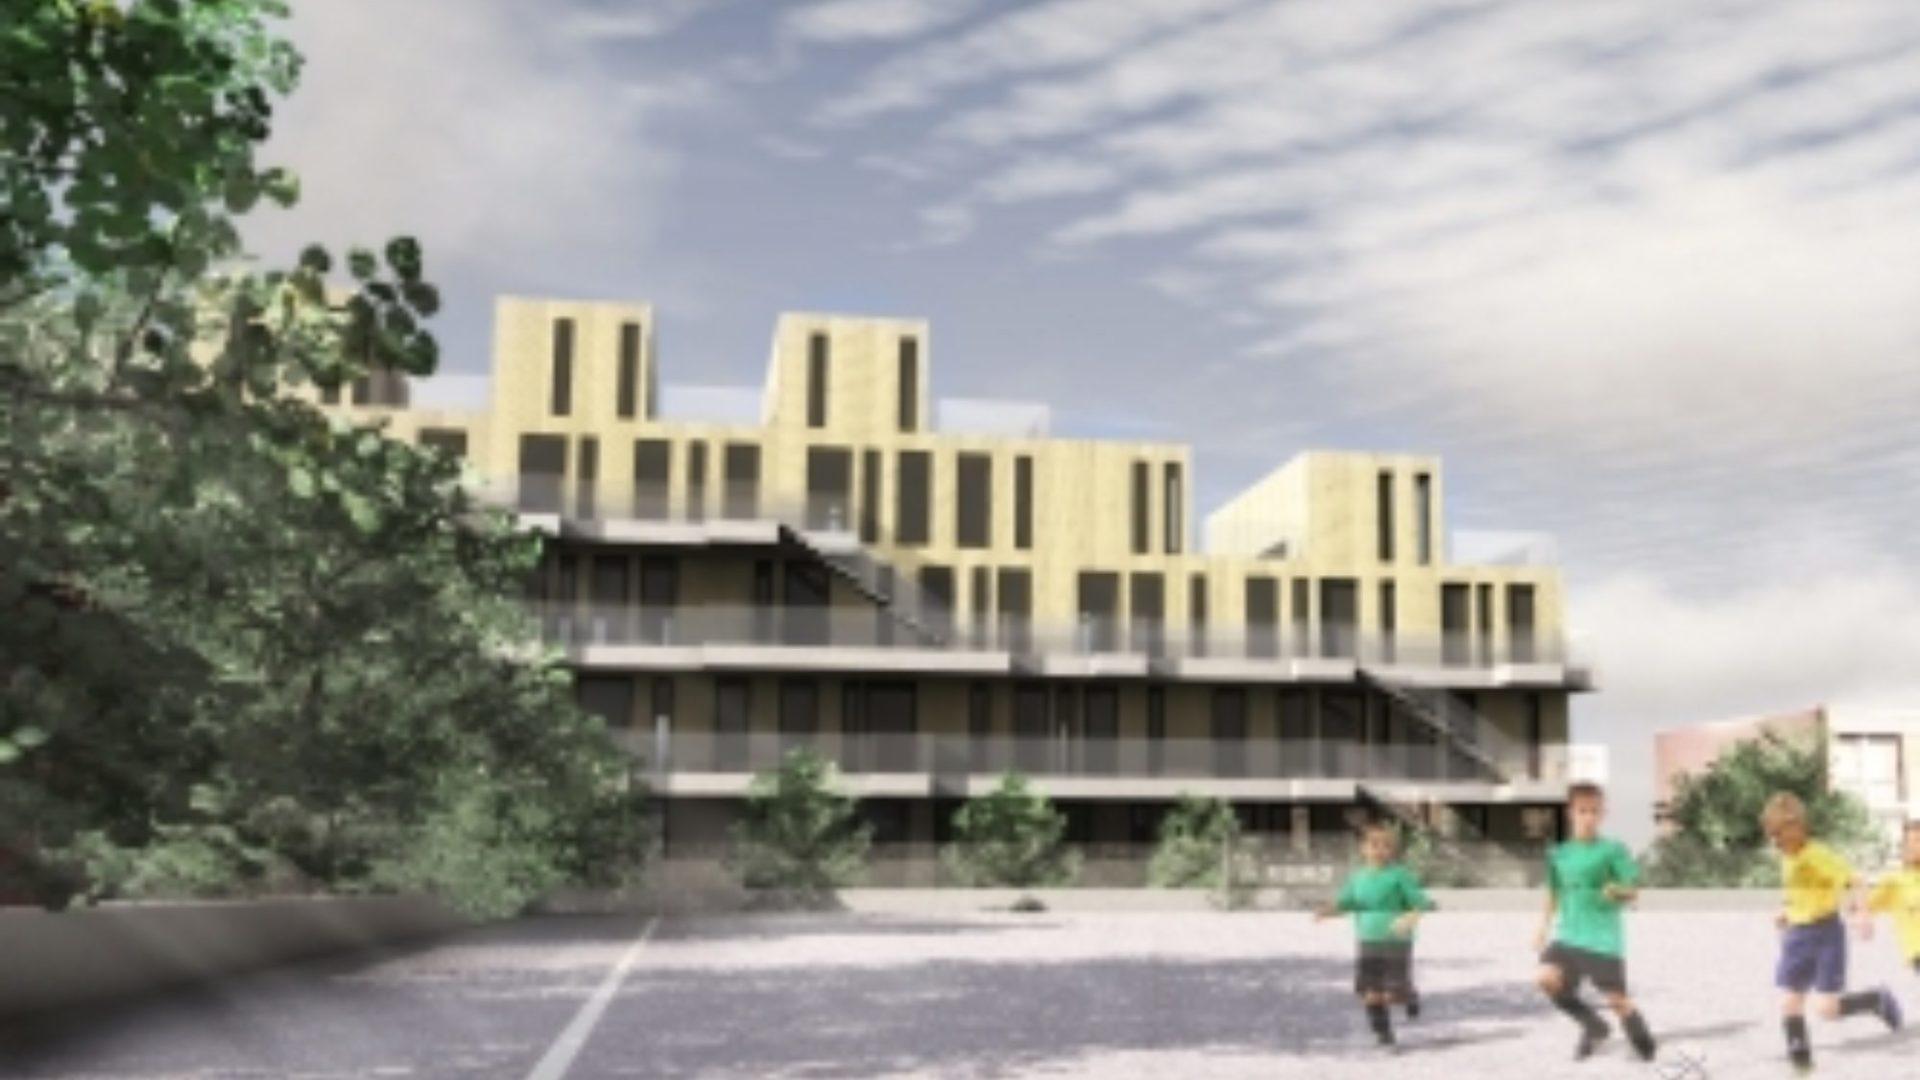 Arkitekt Lorentz Kielland